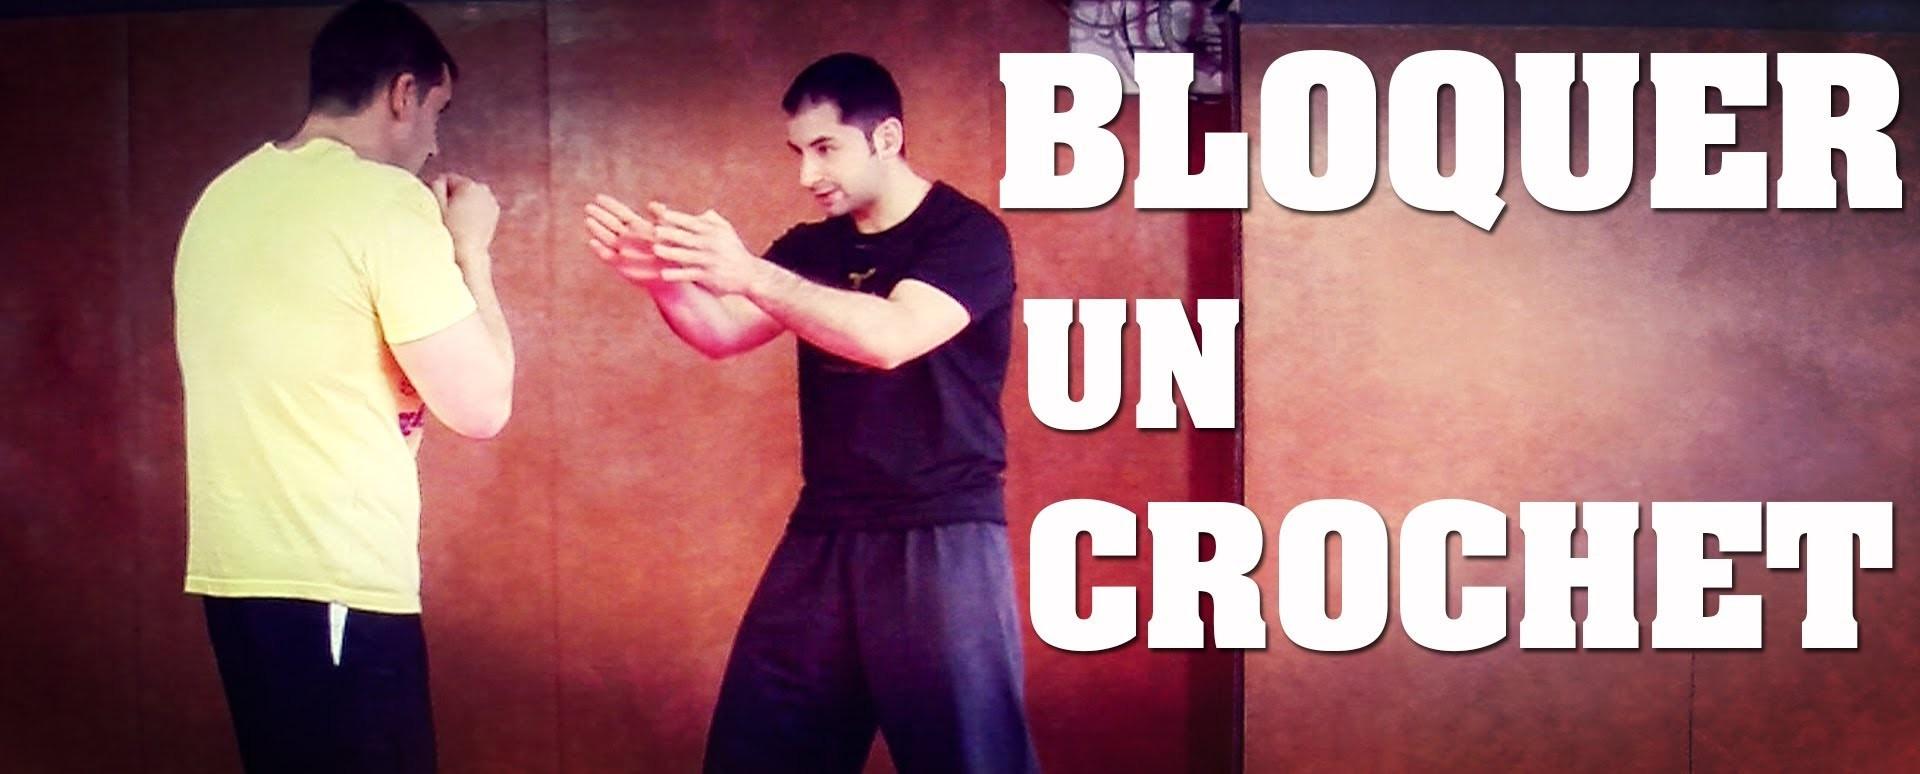 Bloquer un crochet - Wing Chun Kung Fu